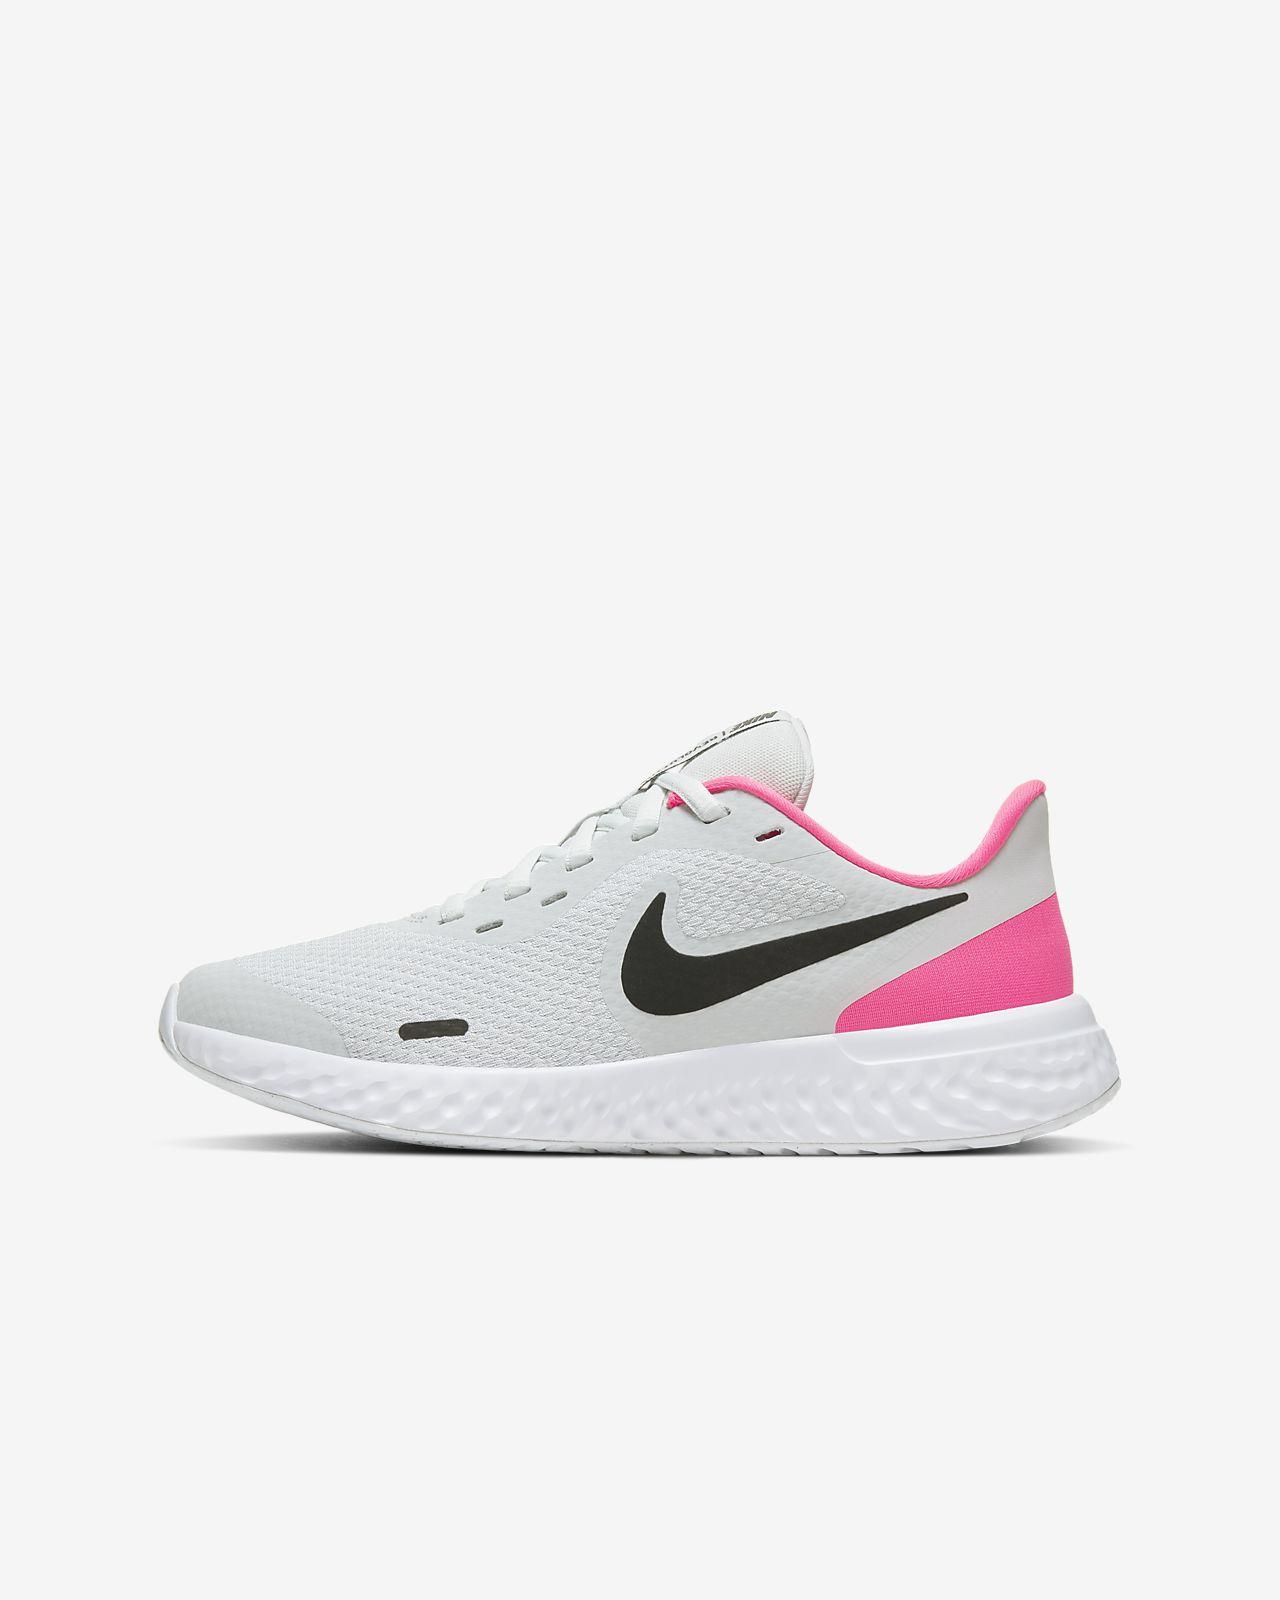 Sapatilhas de running Nike Revolution 5 Júnior